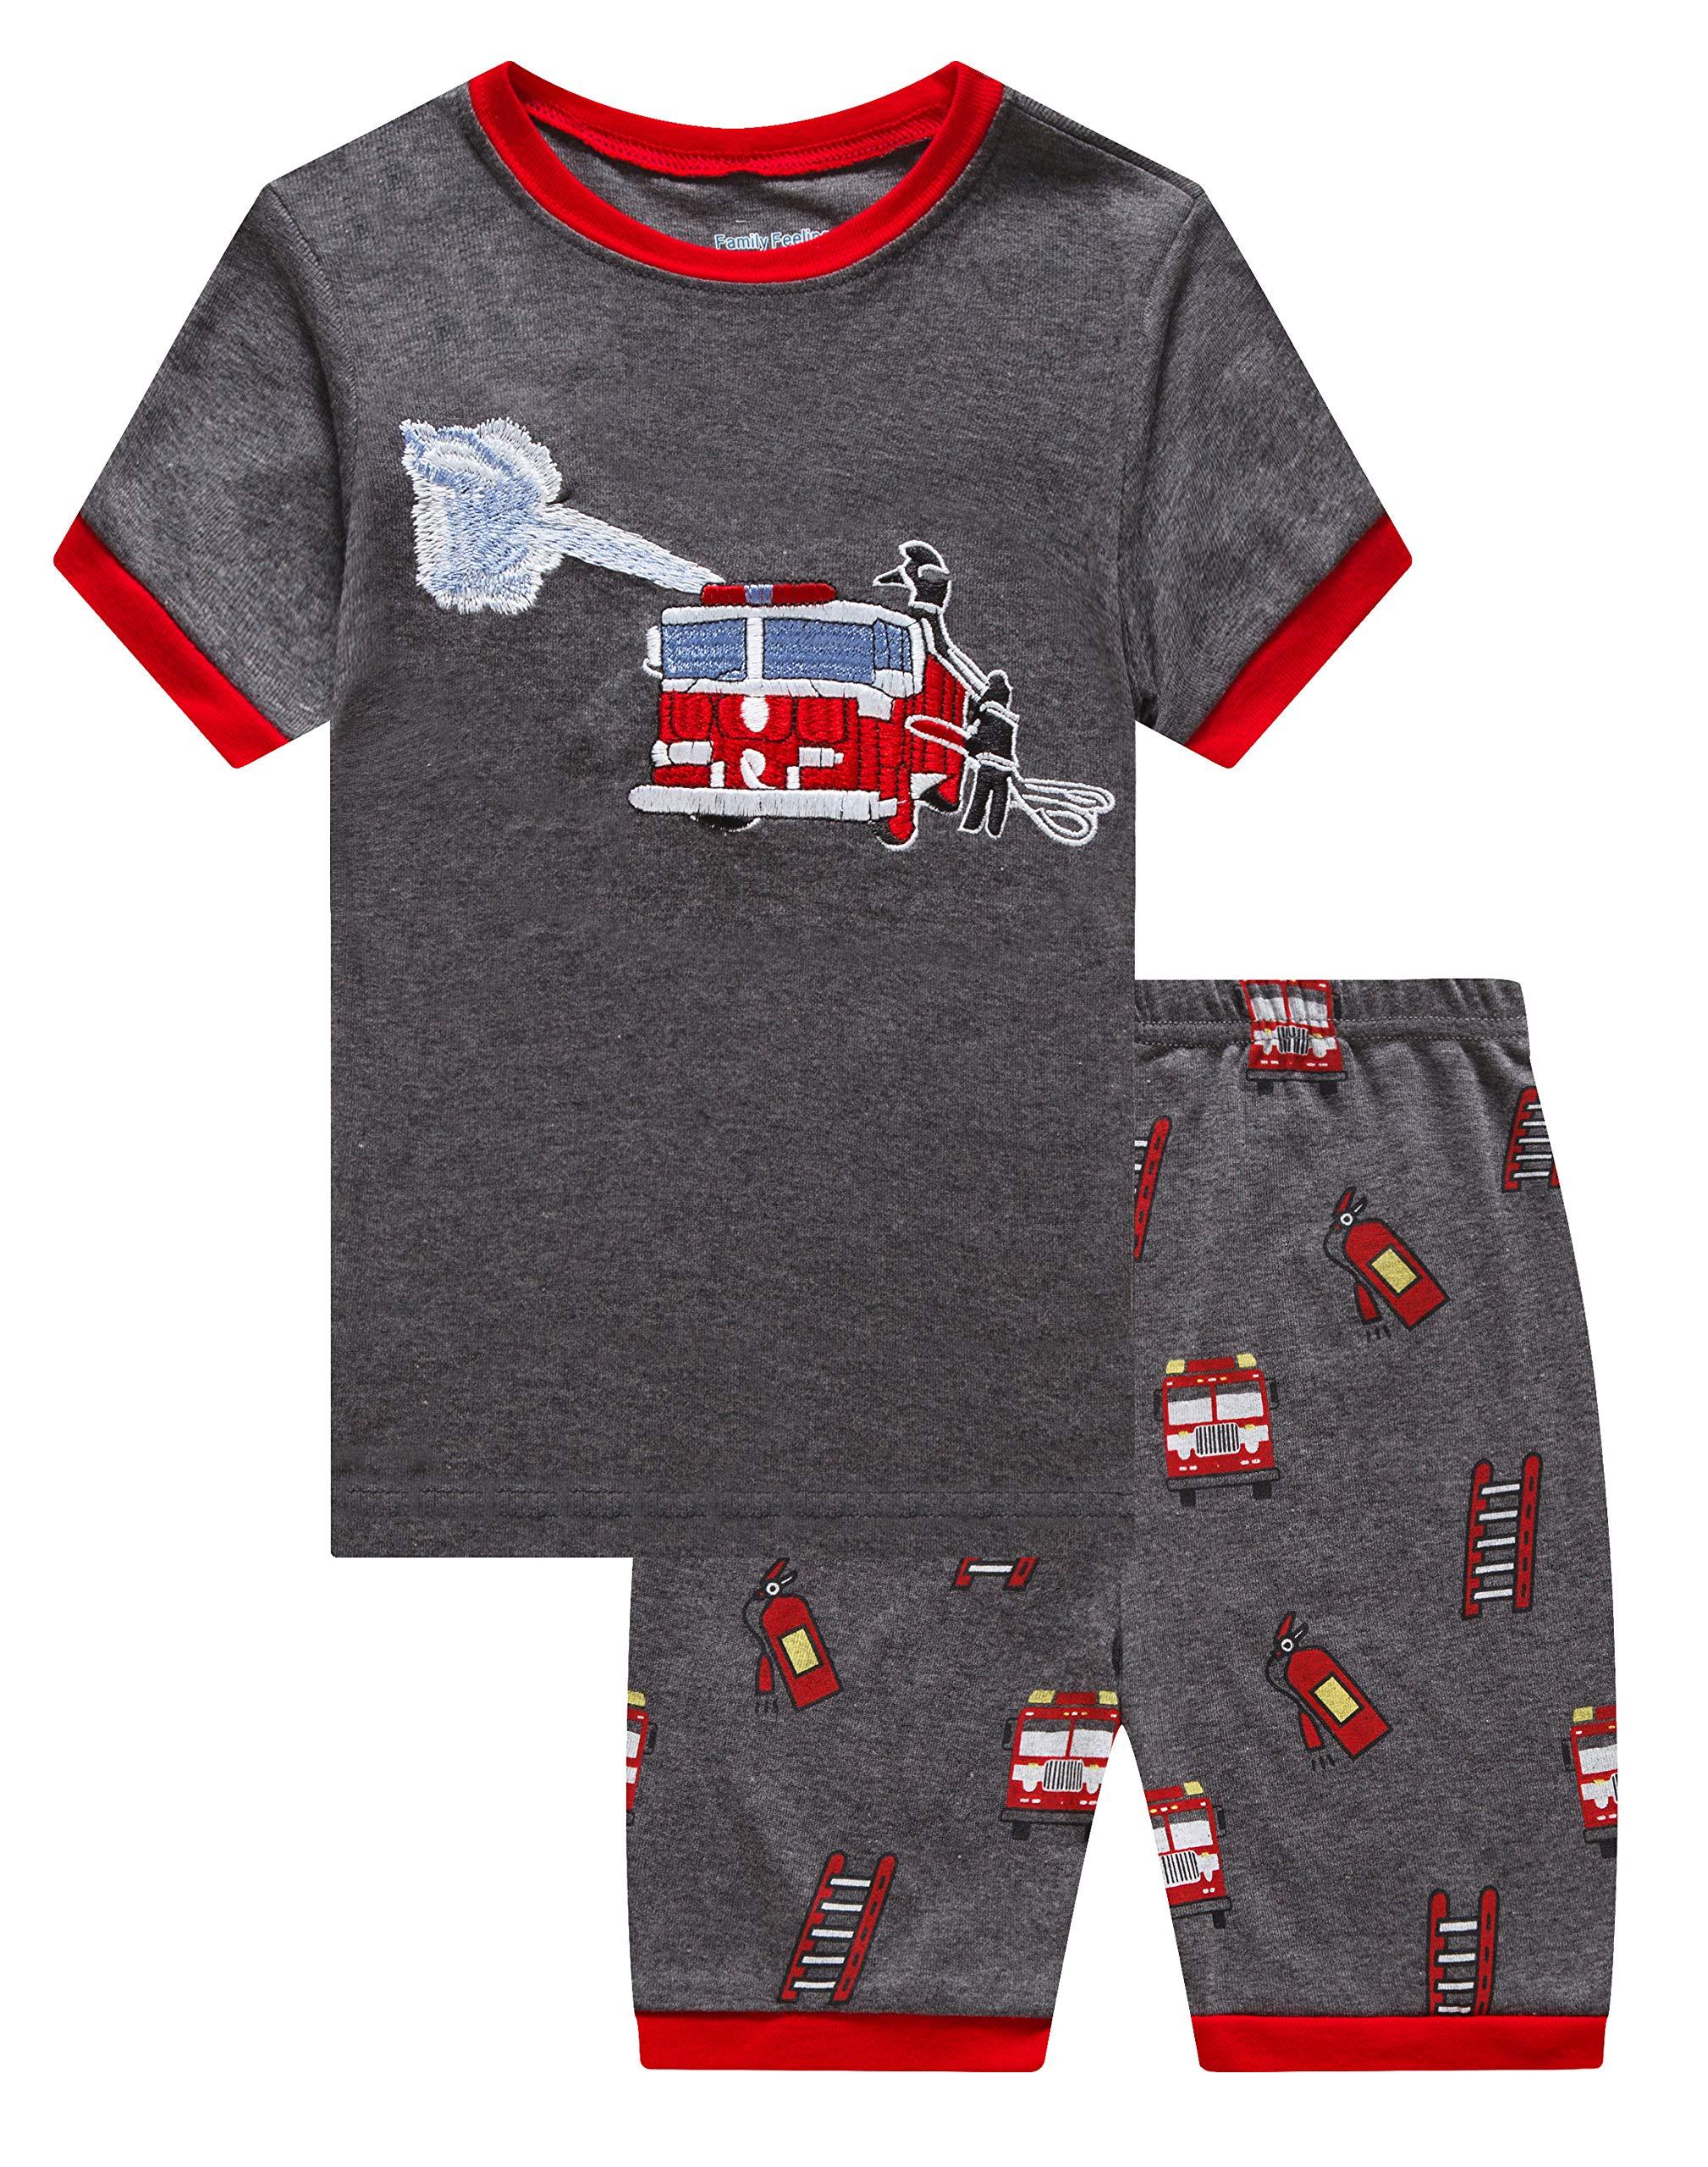 de068b895 Family Feeling Shark Little Boys Shorts Set Pajamas 100% Cotton Clothes  Toddler Kid product image